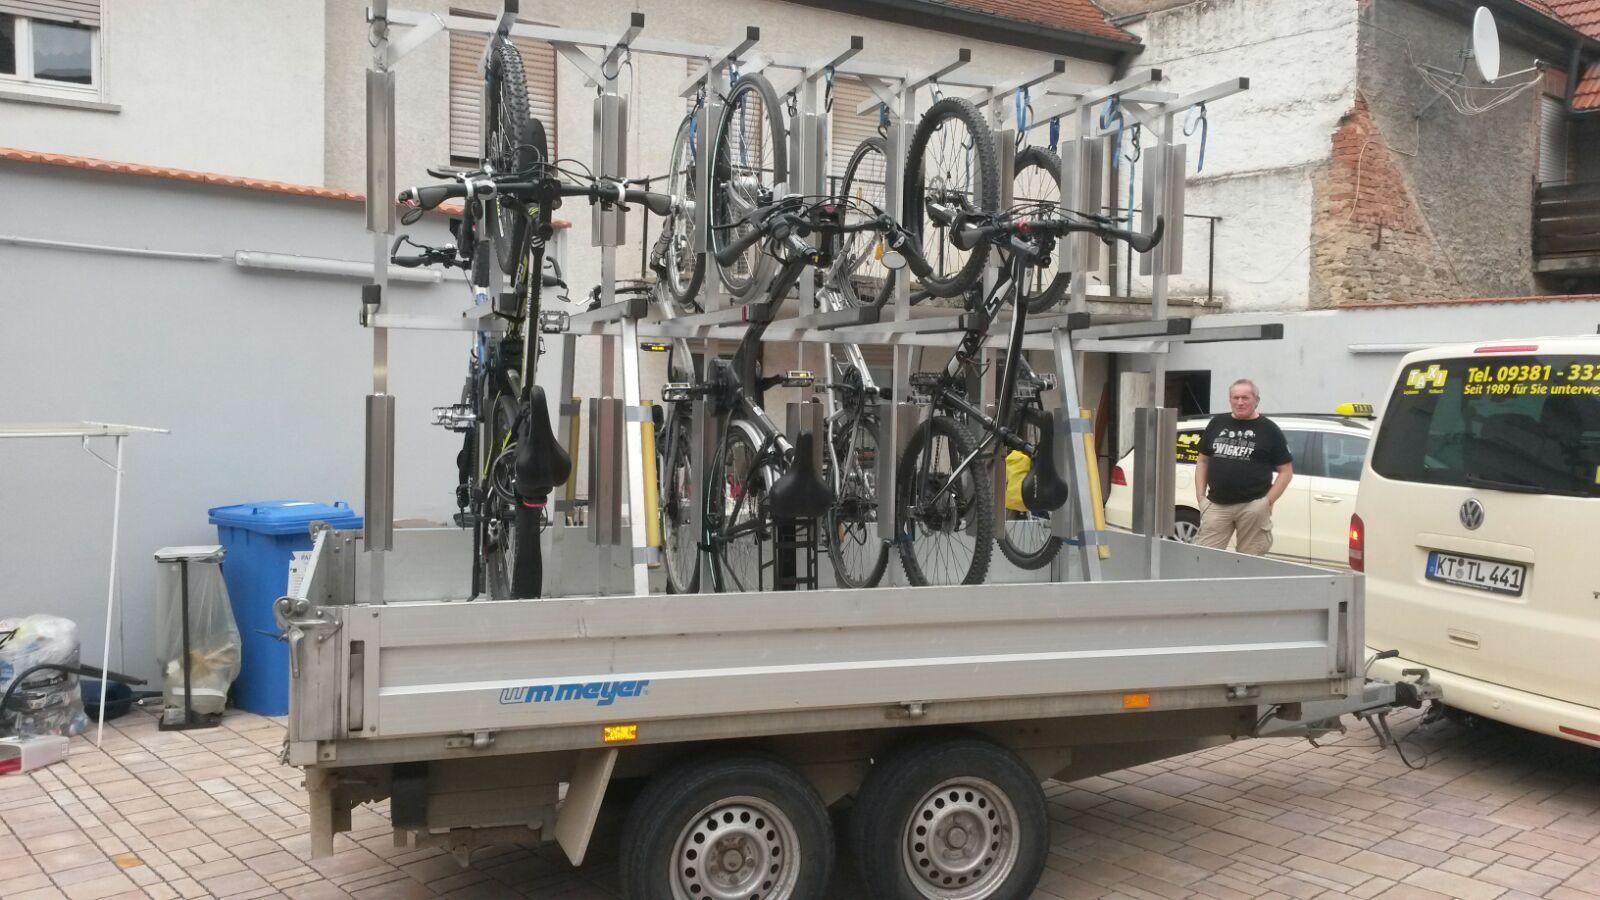 fahrradtransporte in volkach taxi in volkach. Black Bedroom Furniture Sets. Home Design Ideas